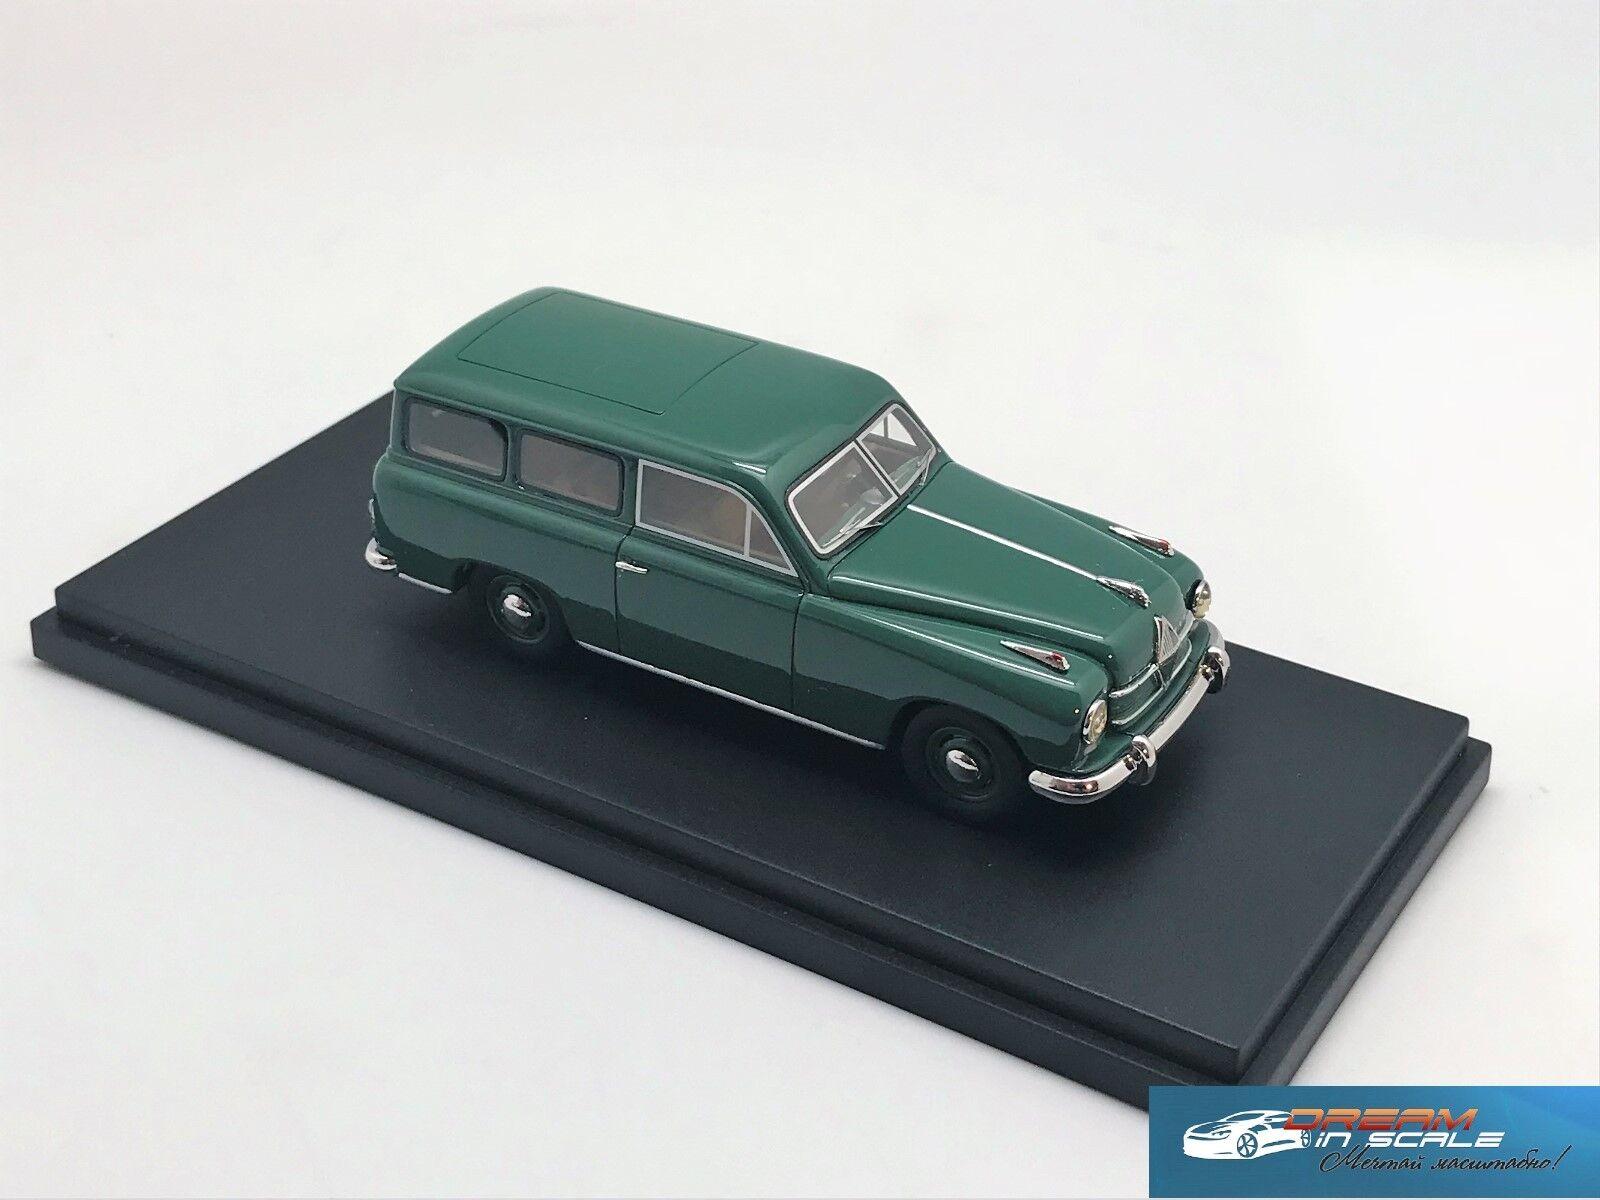 Borgward Hansa 1500 Kombi 1950 BoS-Modelos 43050 43050 43050 1 43 284264